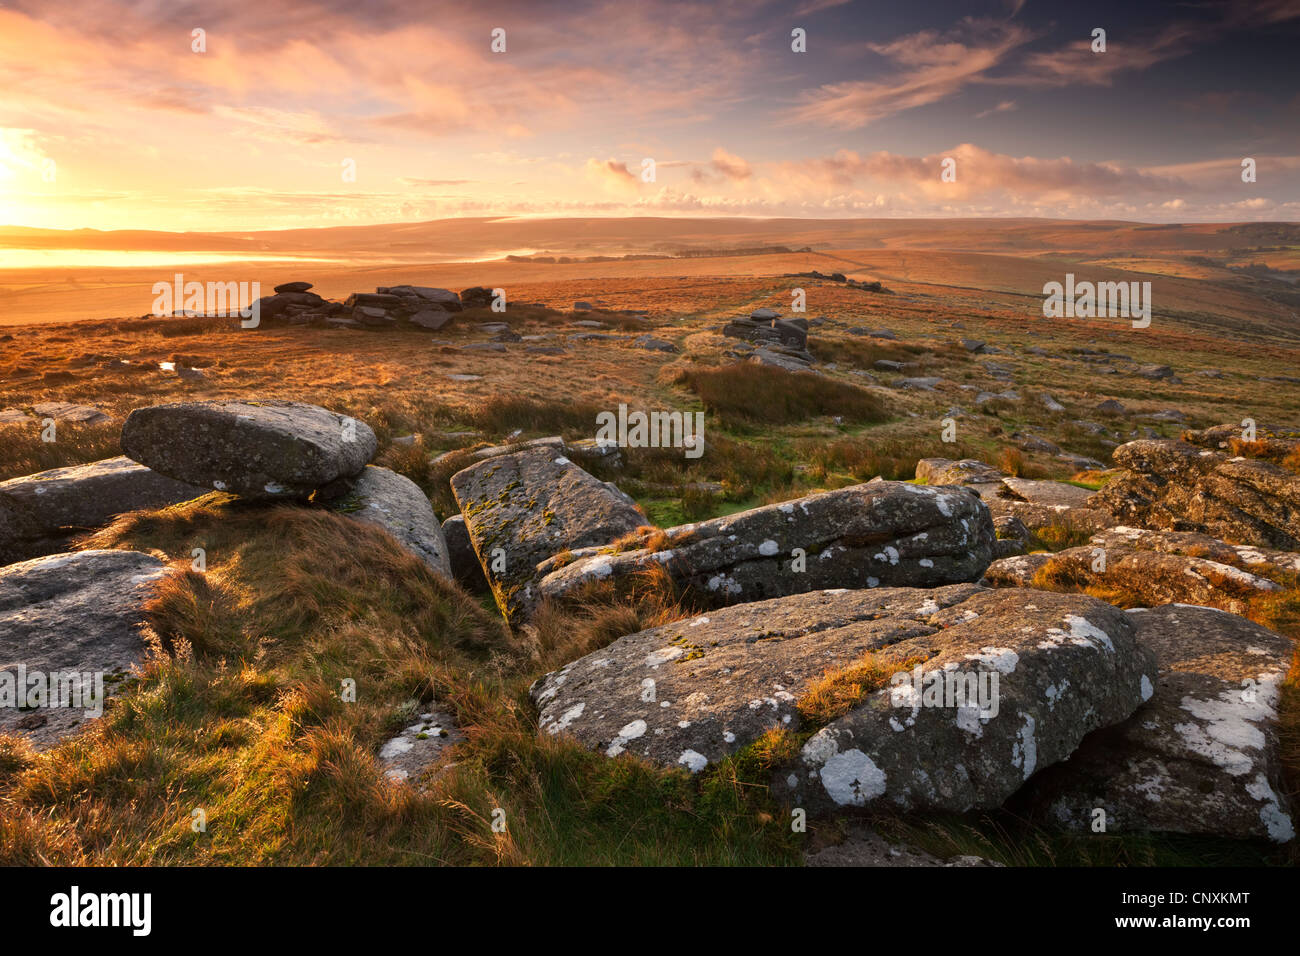 Dawn at Littaford Tor, Dartmoor, Devon, England. Autumn (October) 2011. - Stock Image